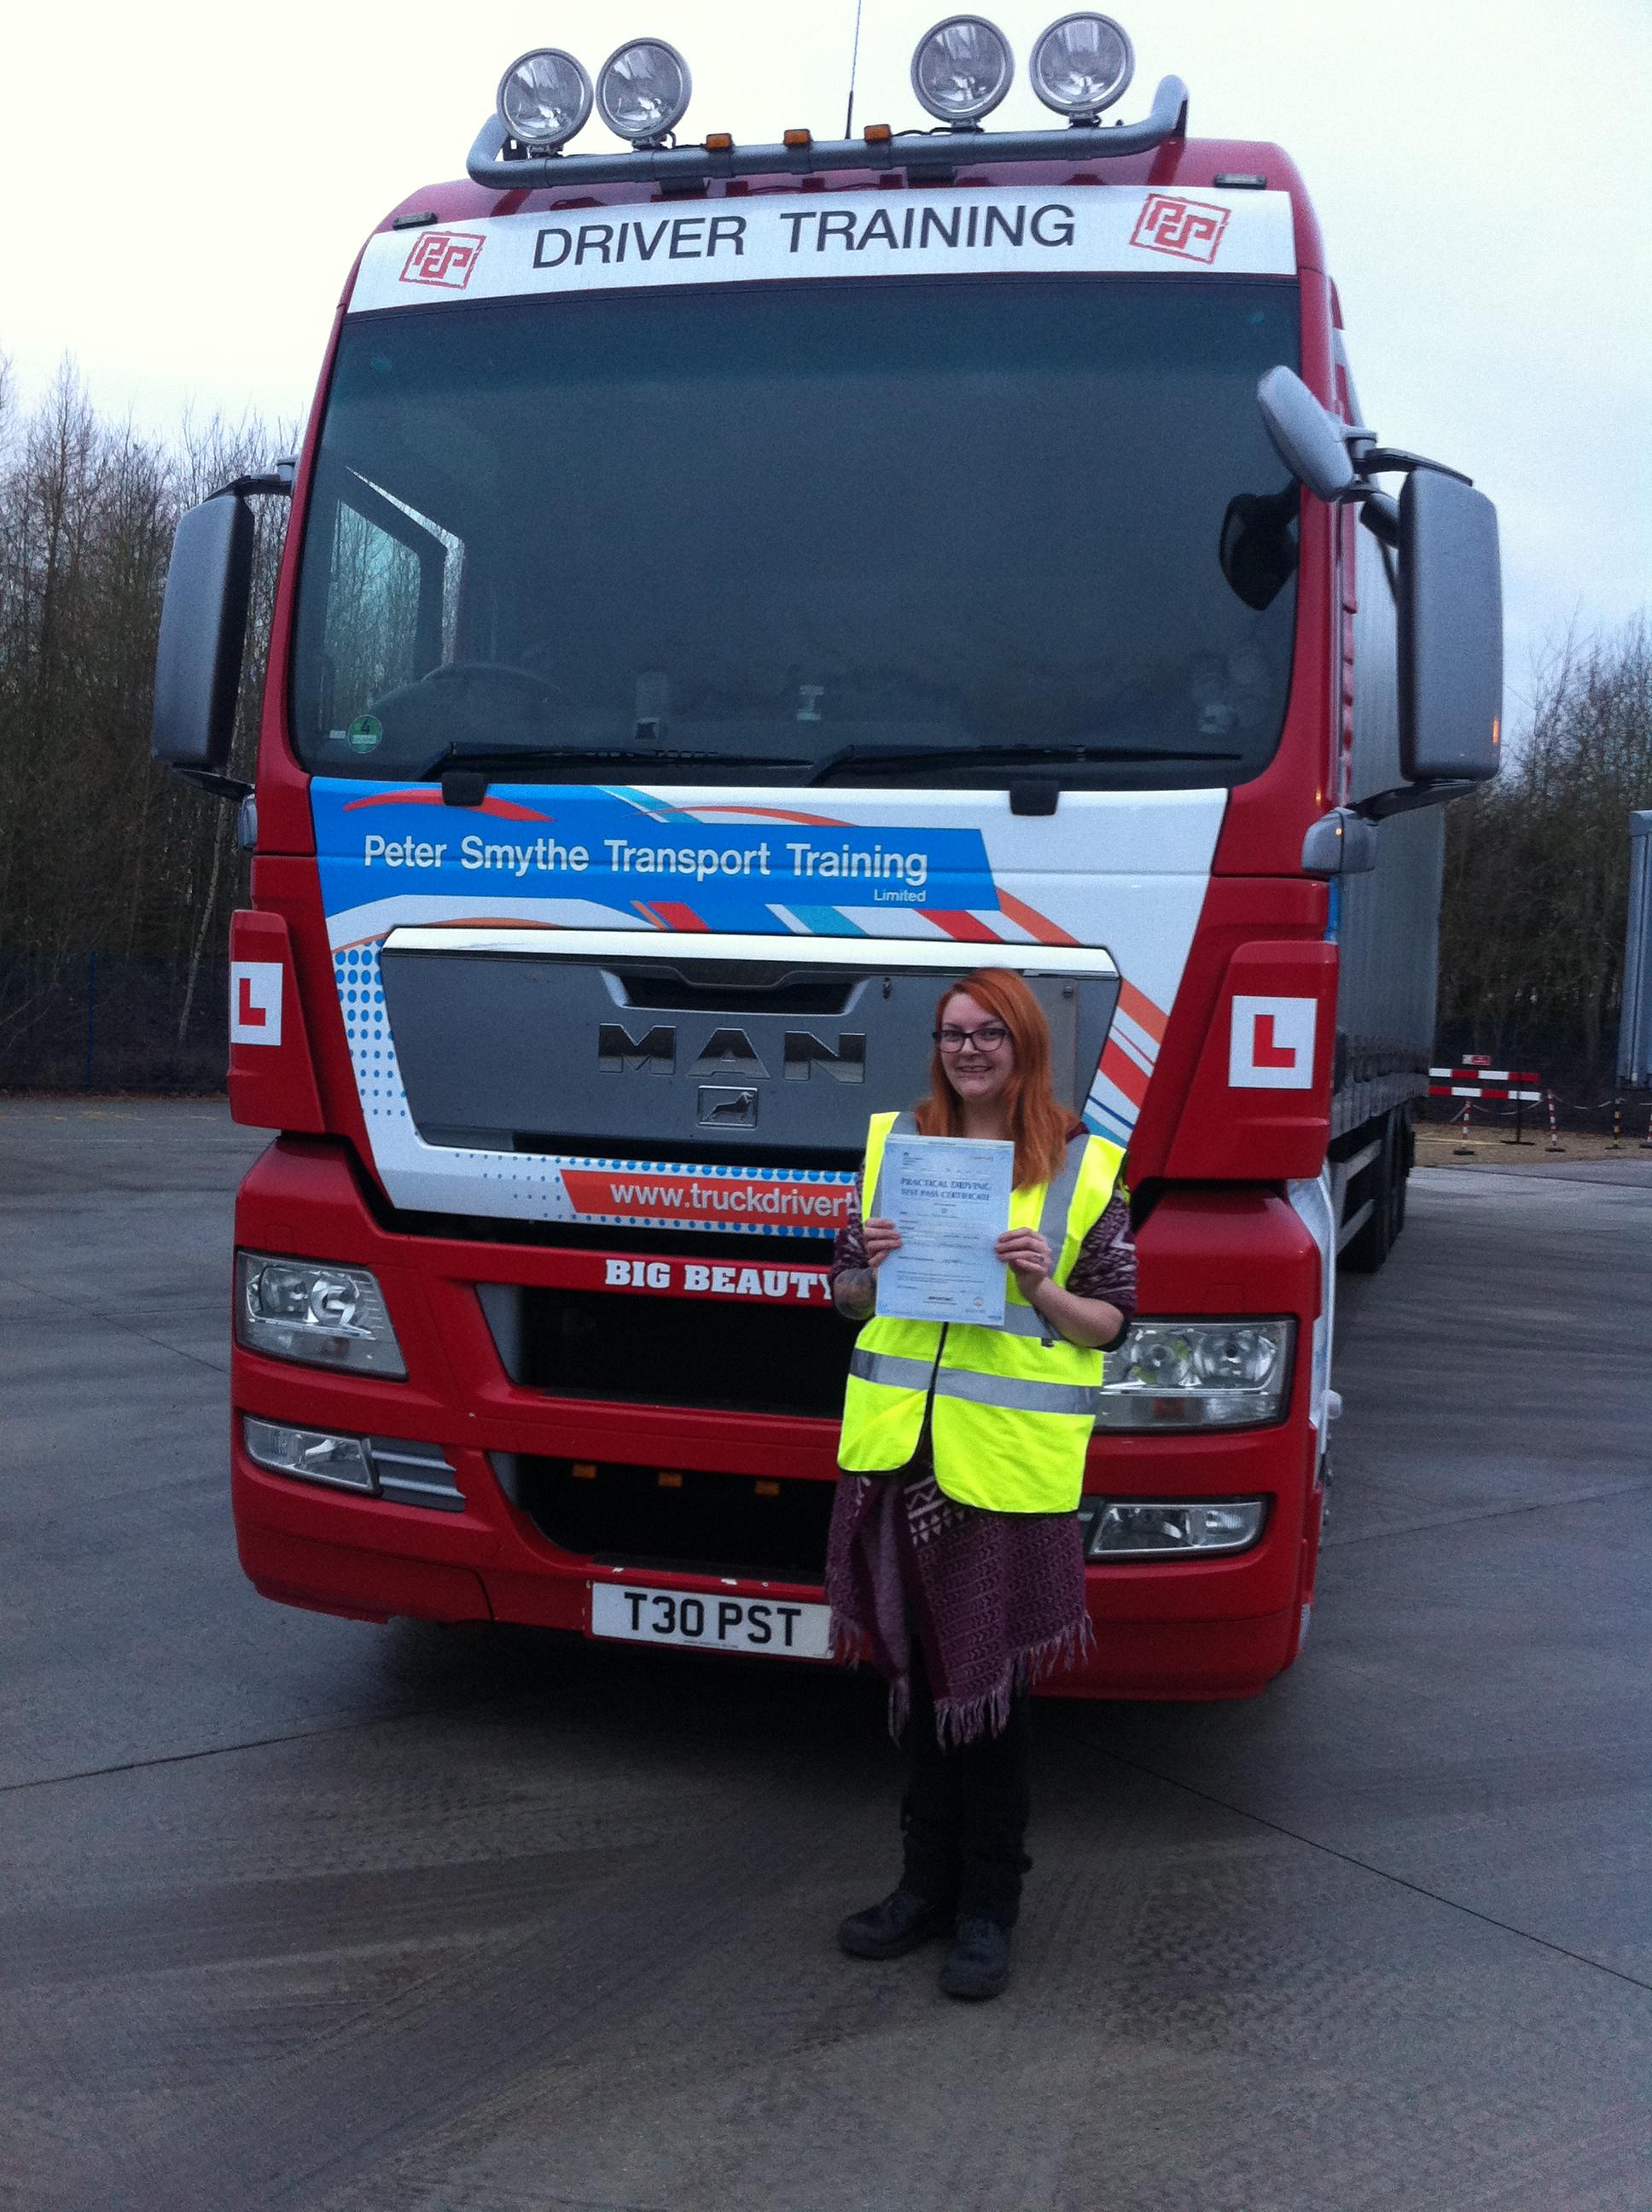 Peter Smythe Transport Training LTD. Chloe Baronowski Passed CE Nottm